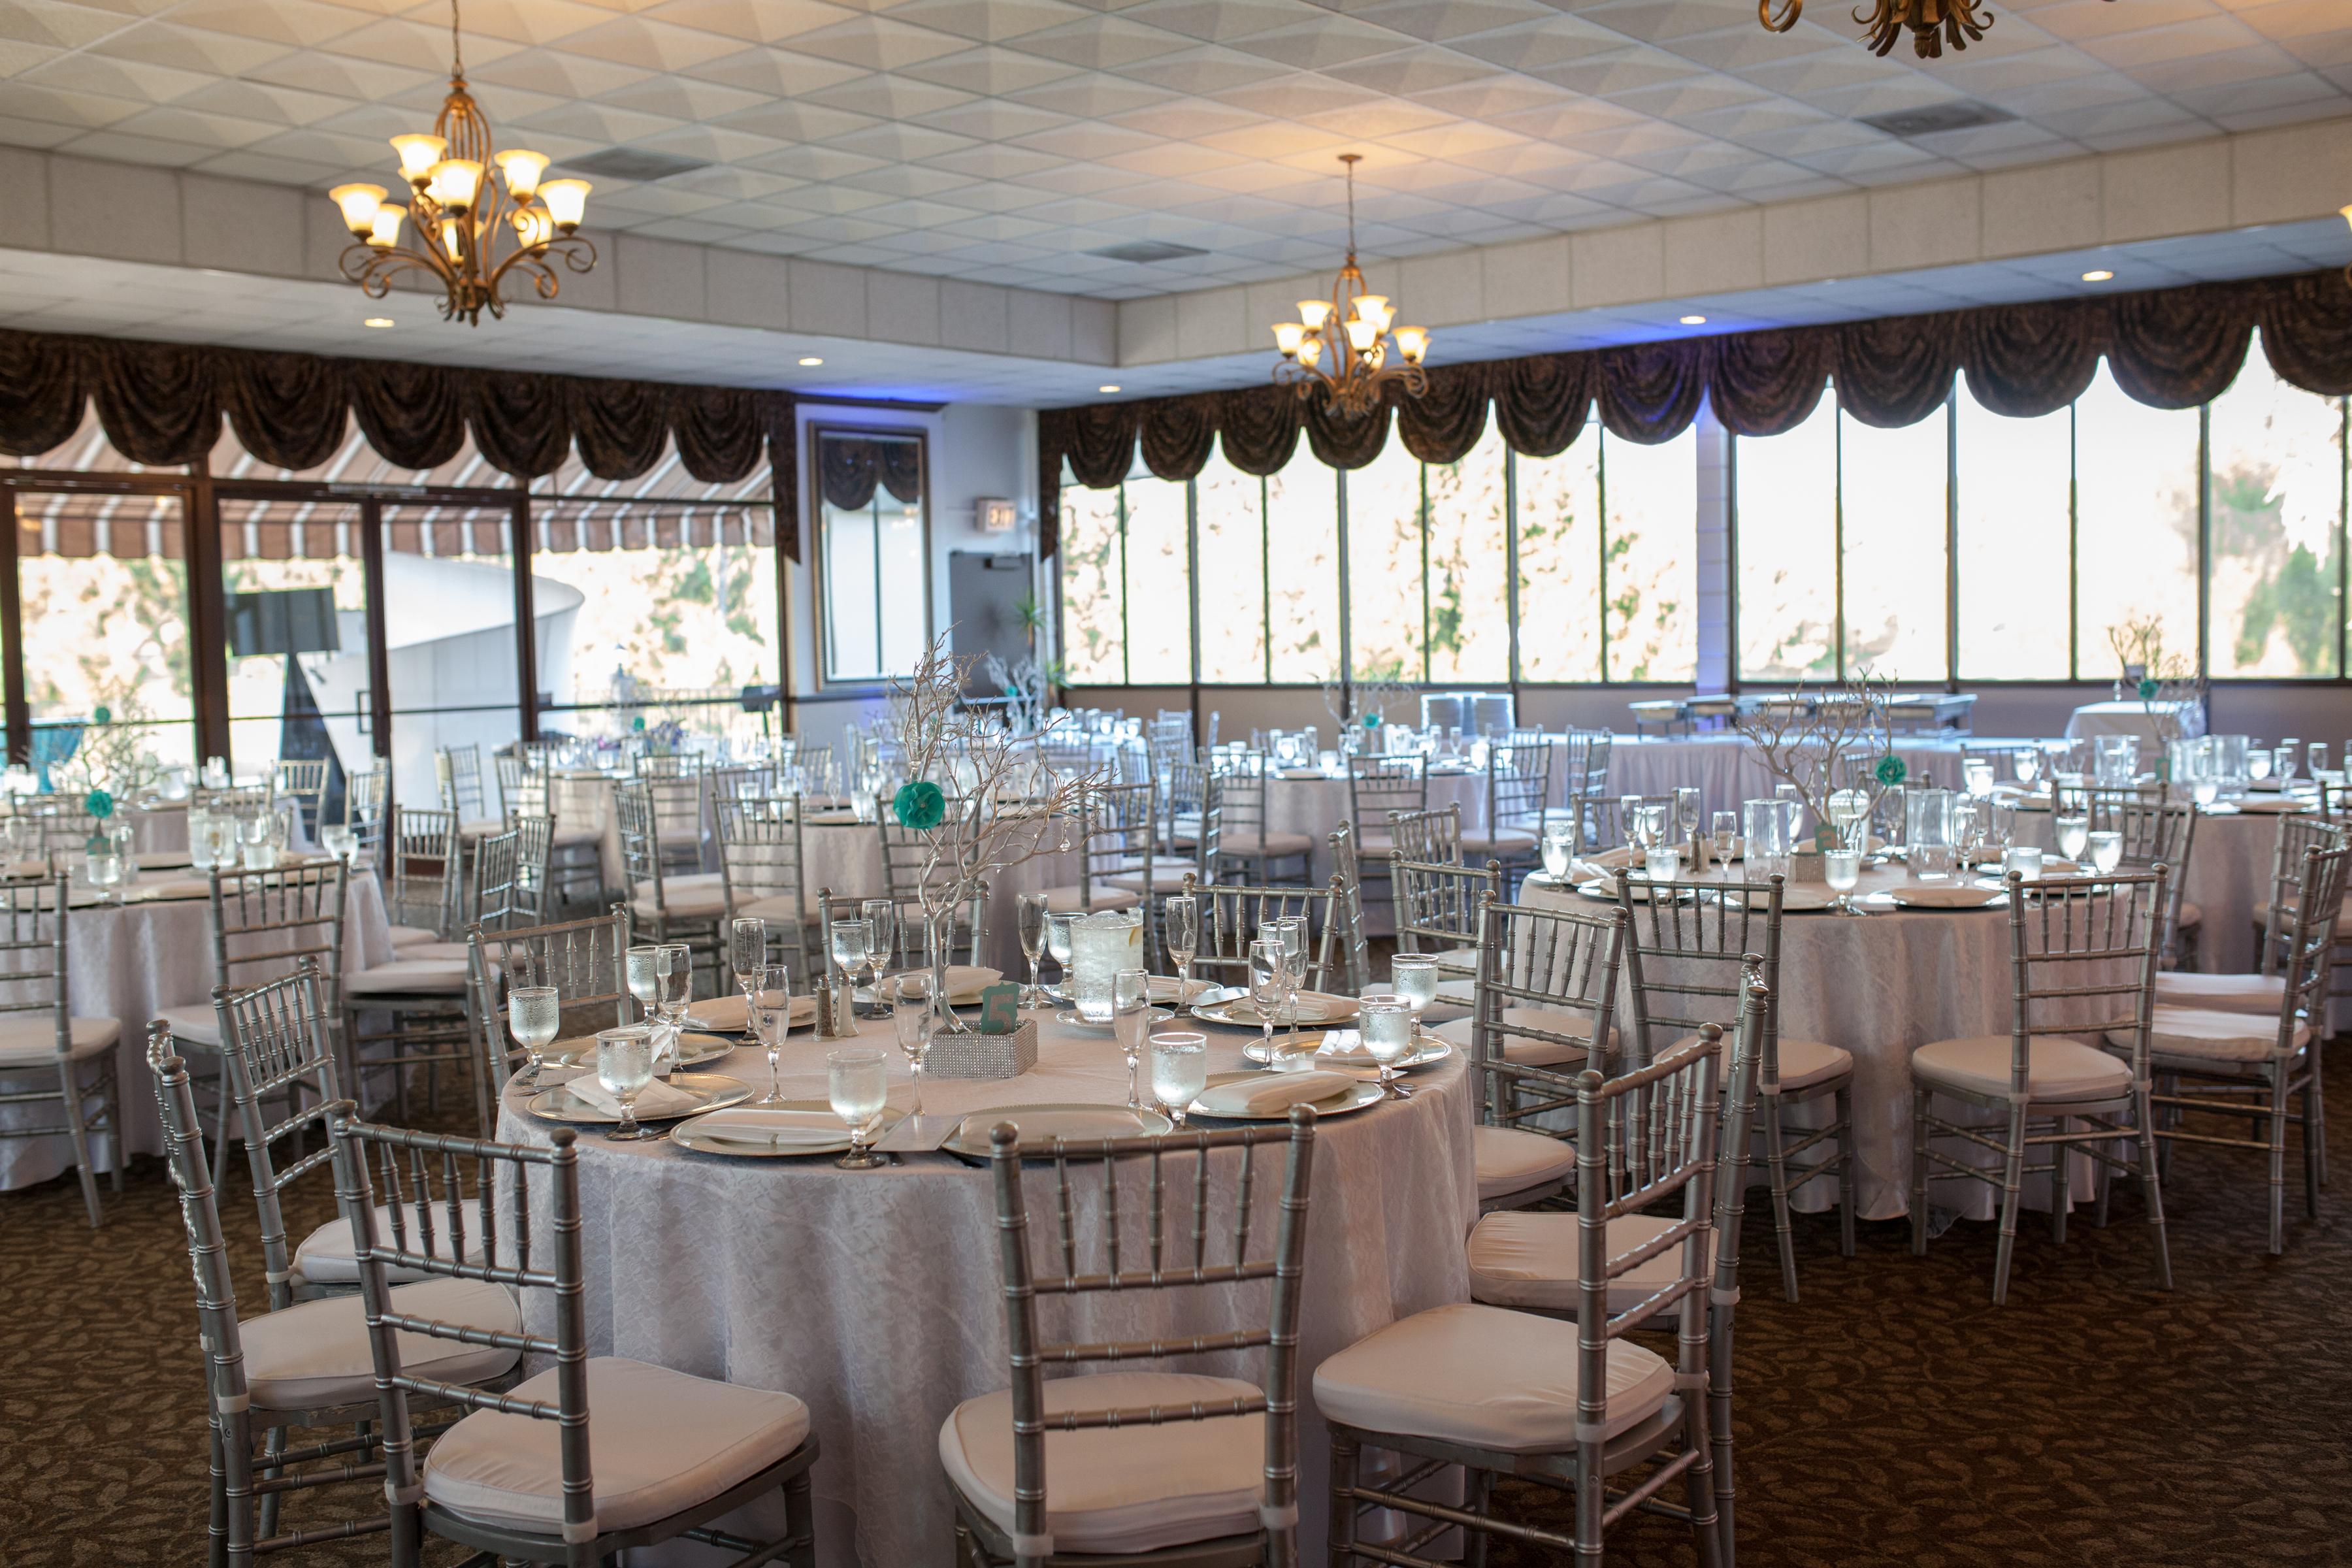 orange county wedding venues country club receptions. Black Bedroom Furniture Sets. Home Design Ideas